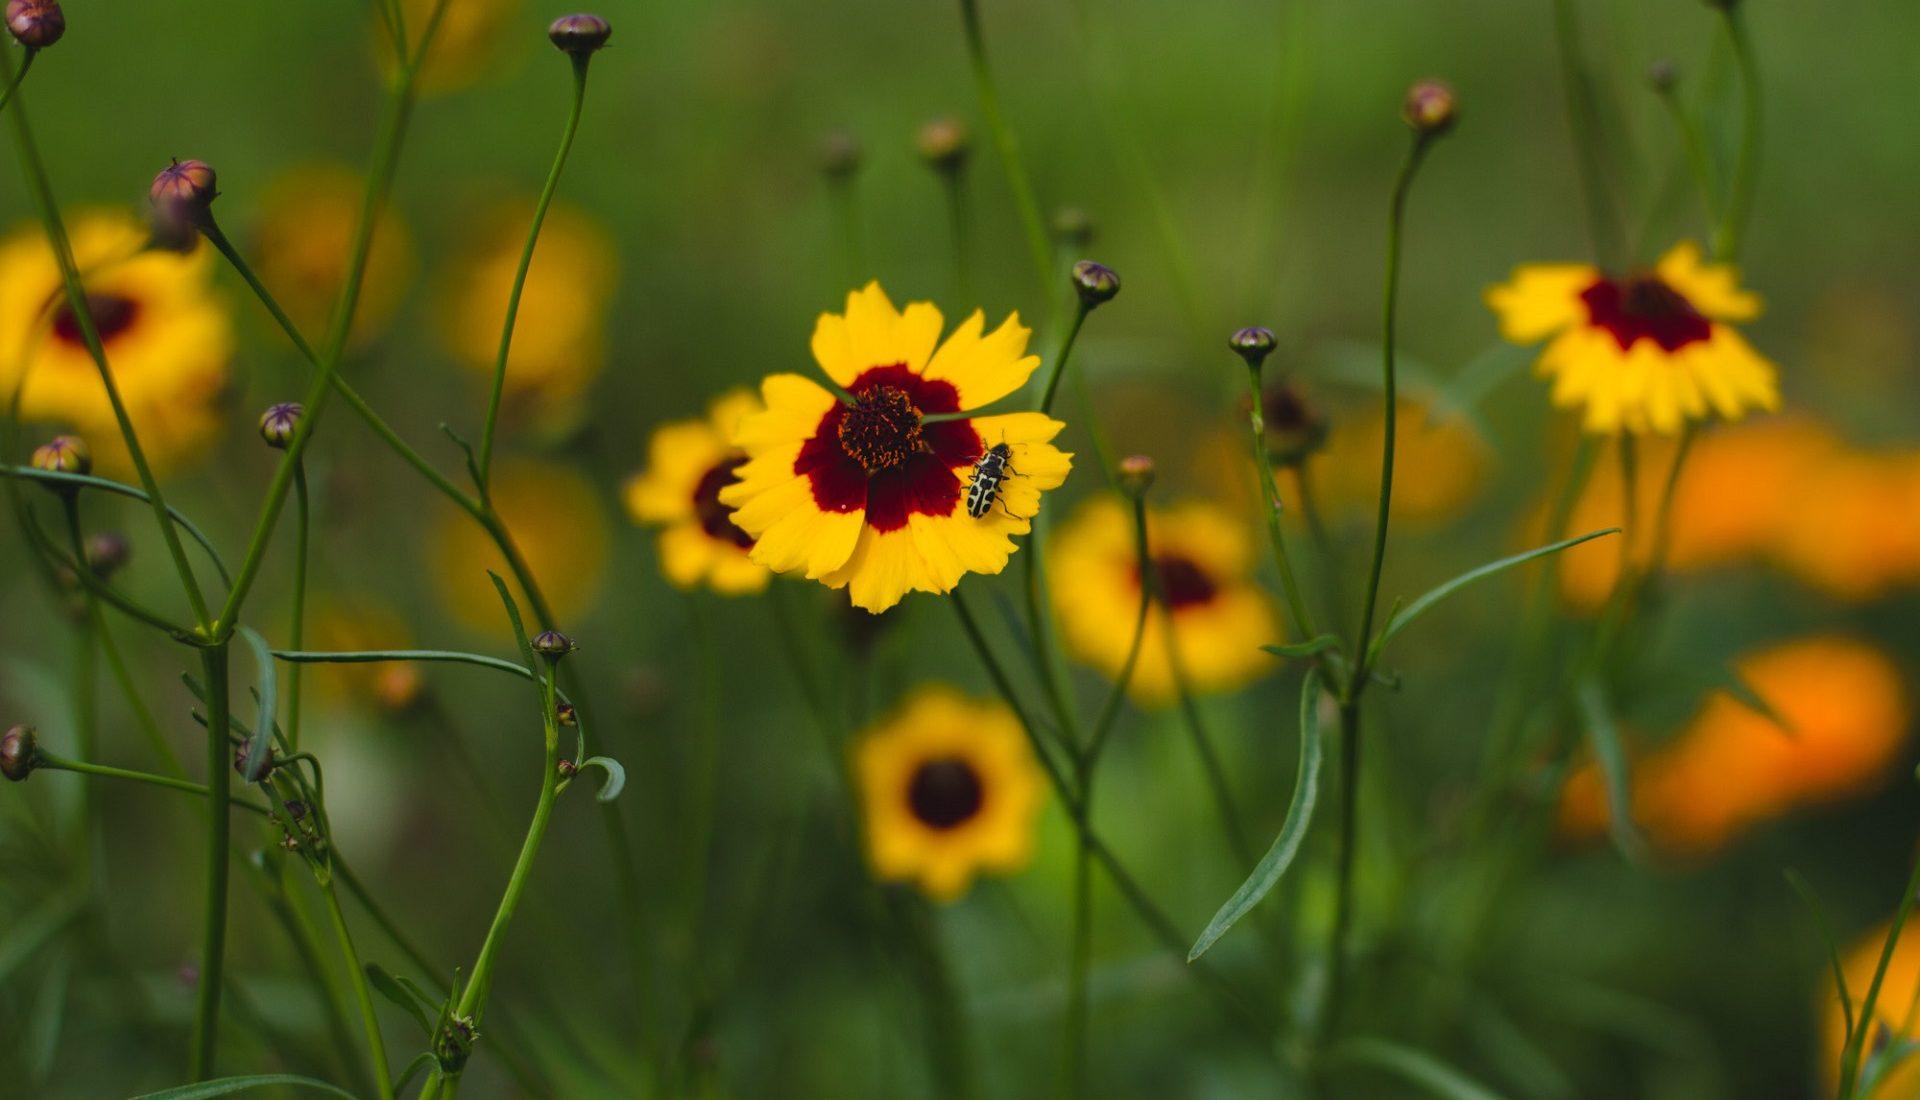 Primavera na Confeitaria | flores naturais para decorar bolos